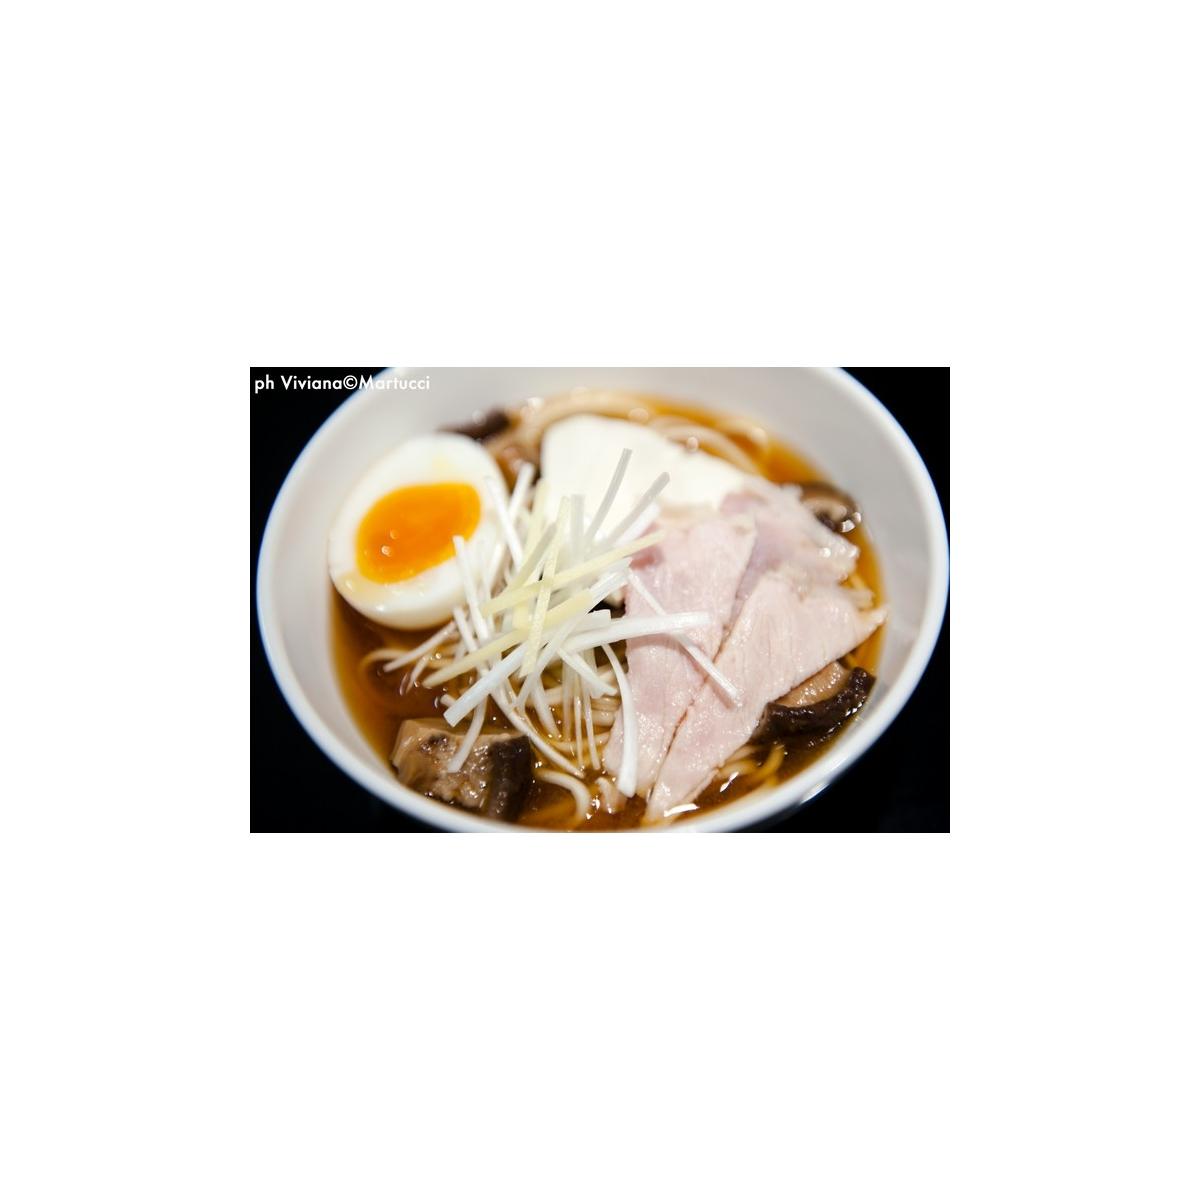 Corso di cucina la cucina giapponese for Corso di cucina giapponese